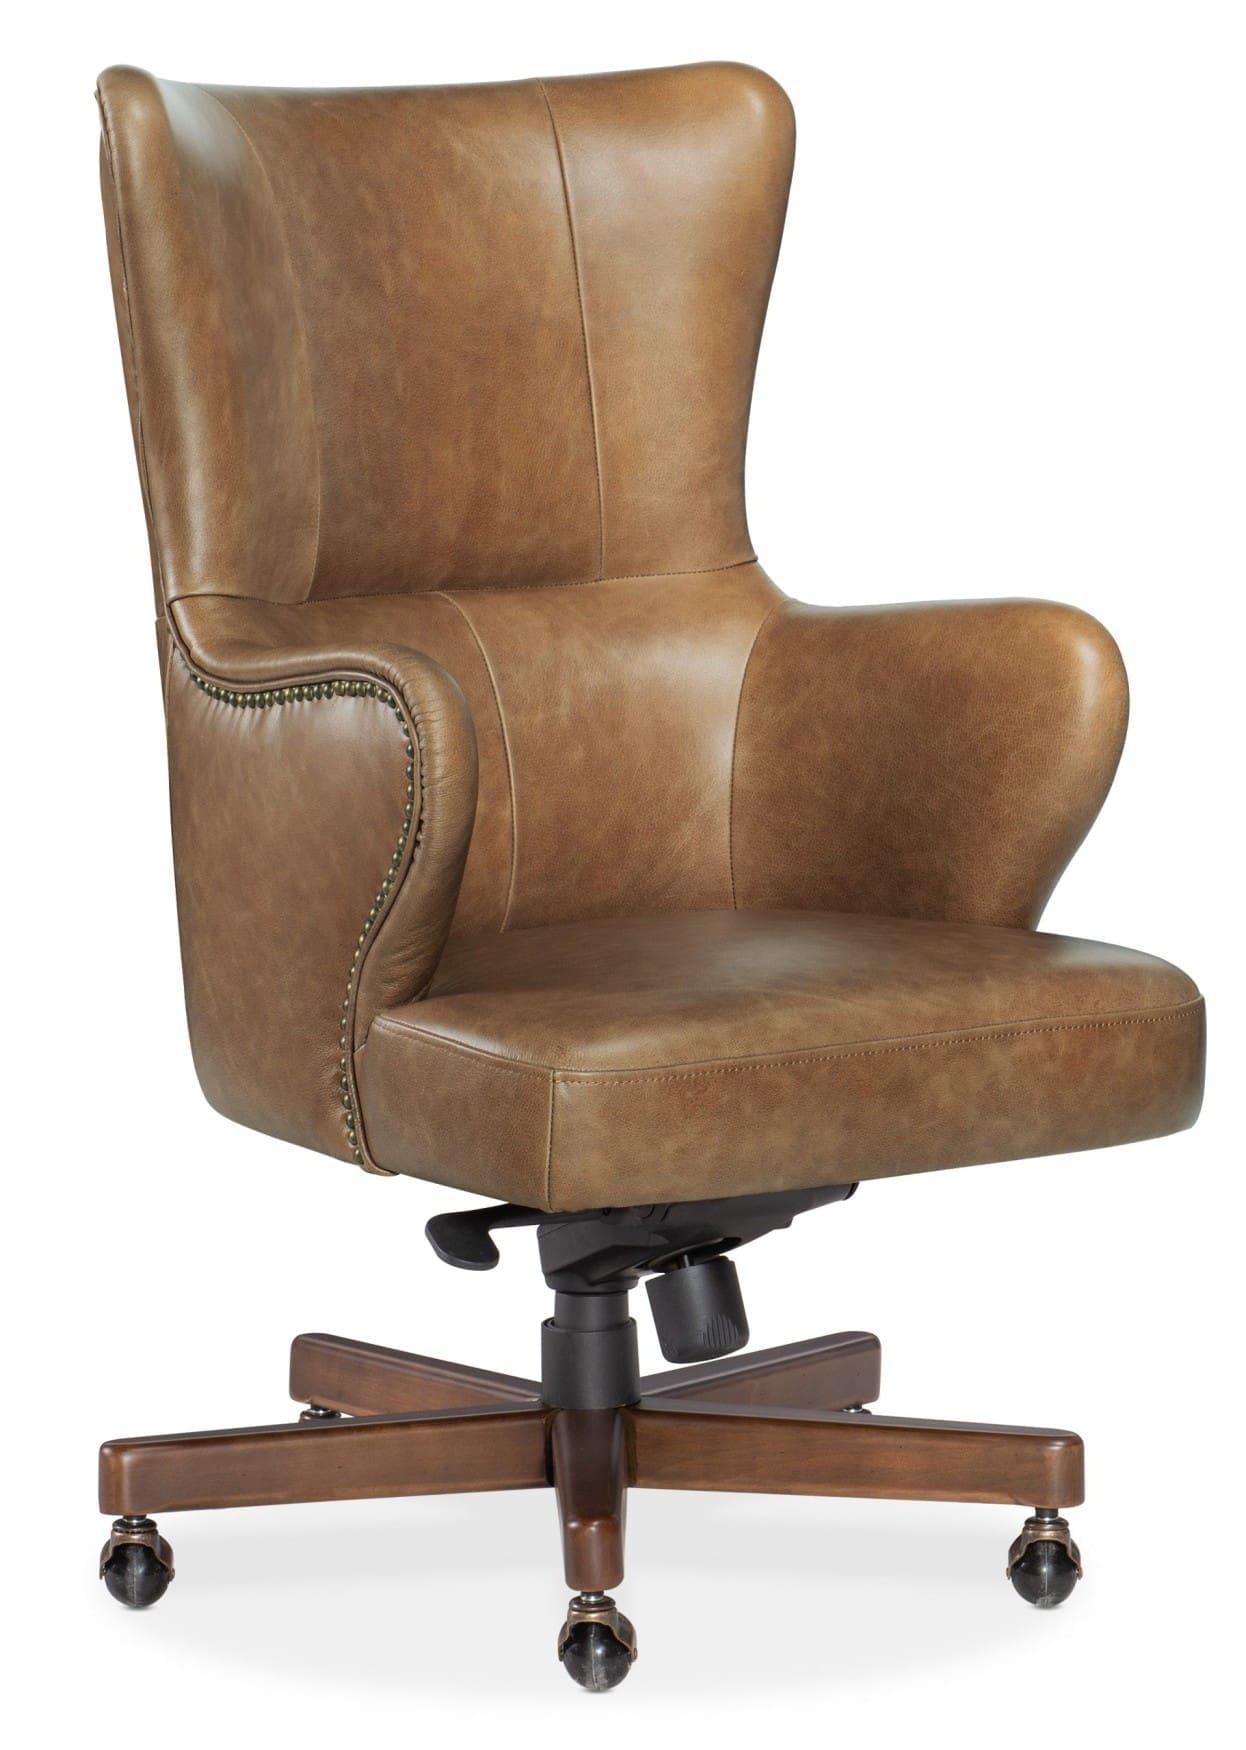 Amelia Executive Swivel Tilt Chair